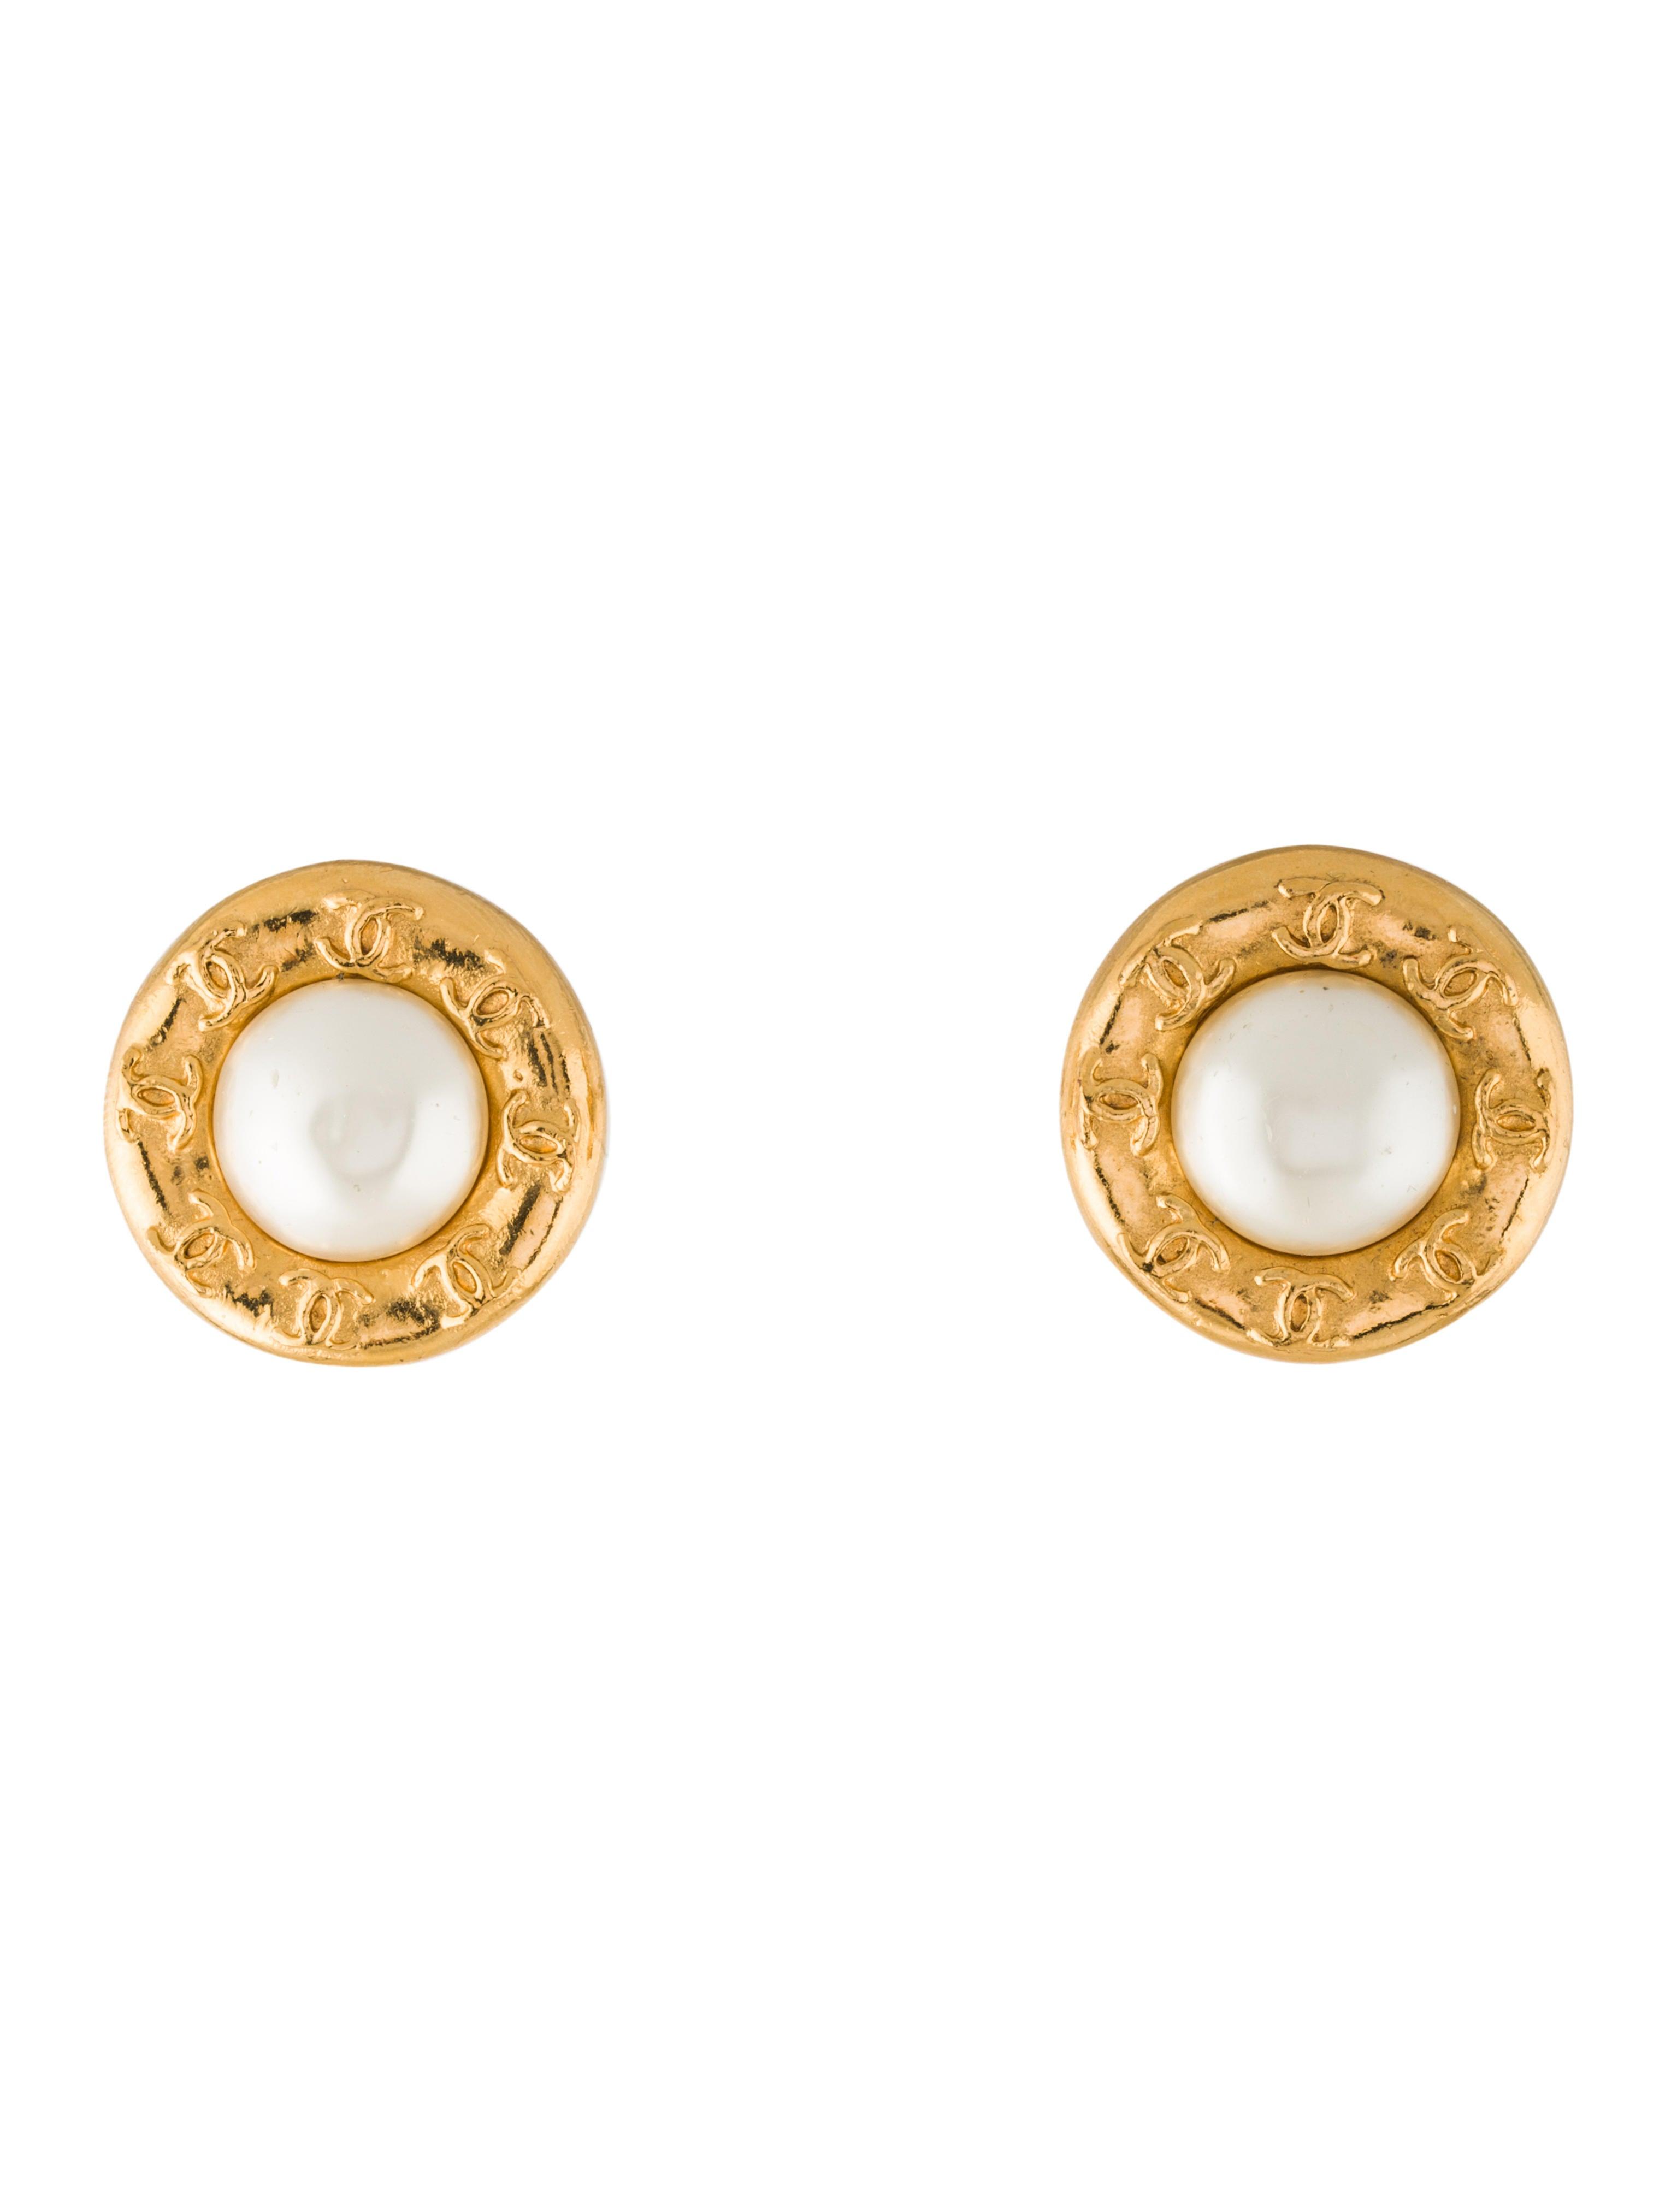 chanel faux pearl button clip on earrings earrings. Black Bedroom Furniture Sets. Home Design Ideas